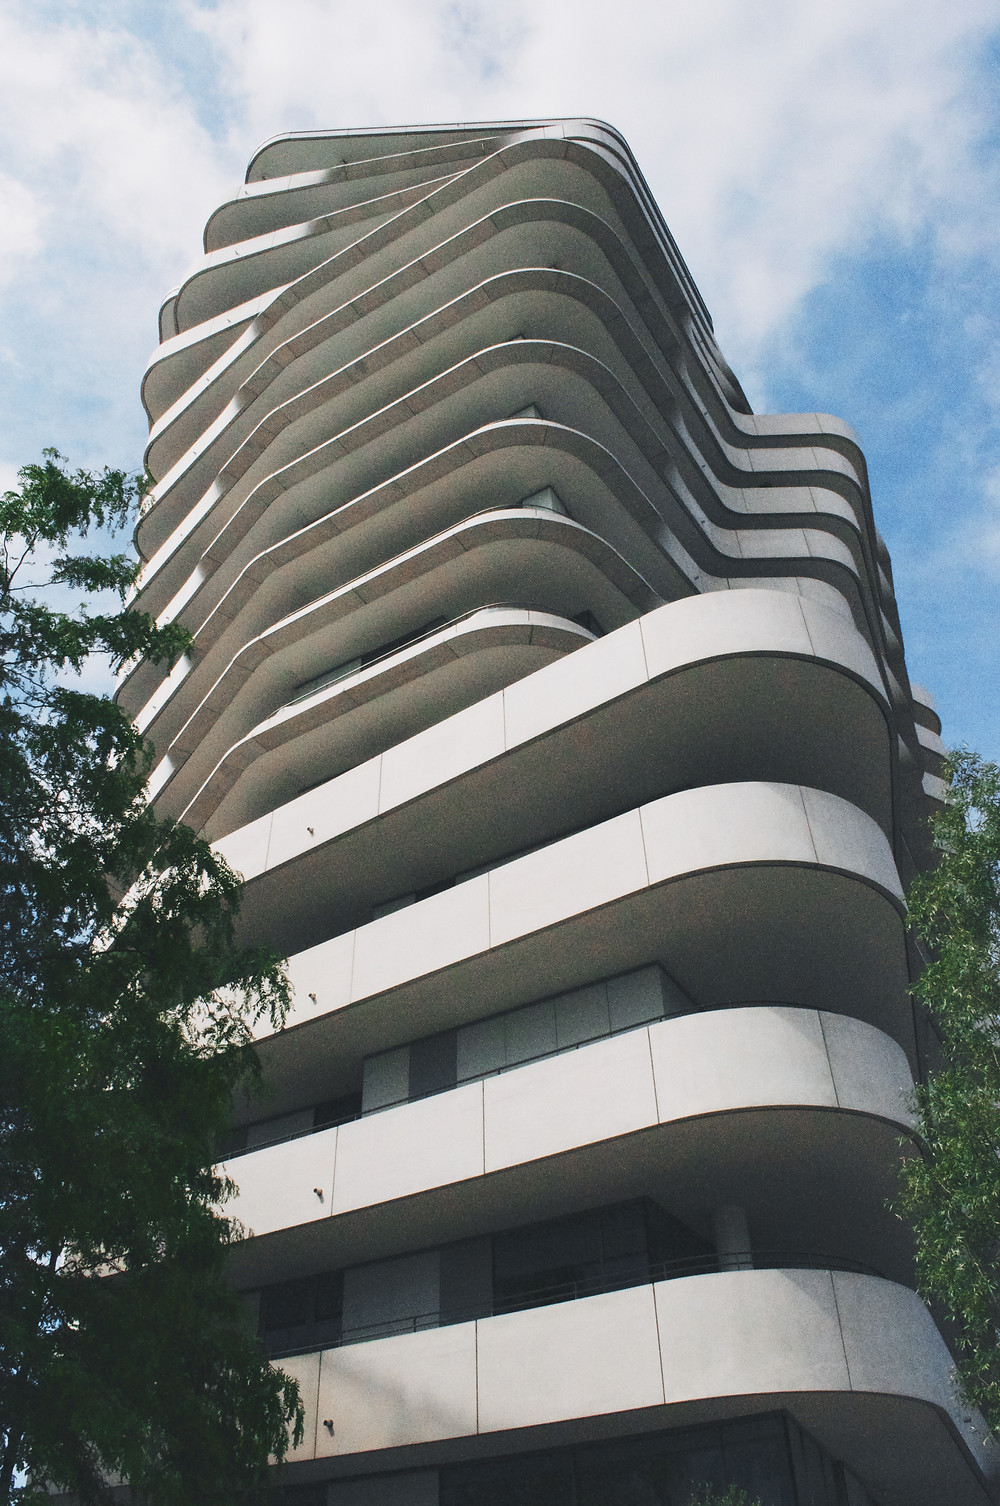 bâtiment aux formes rythmées